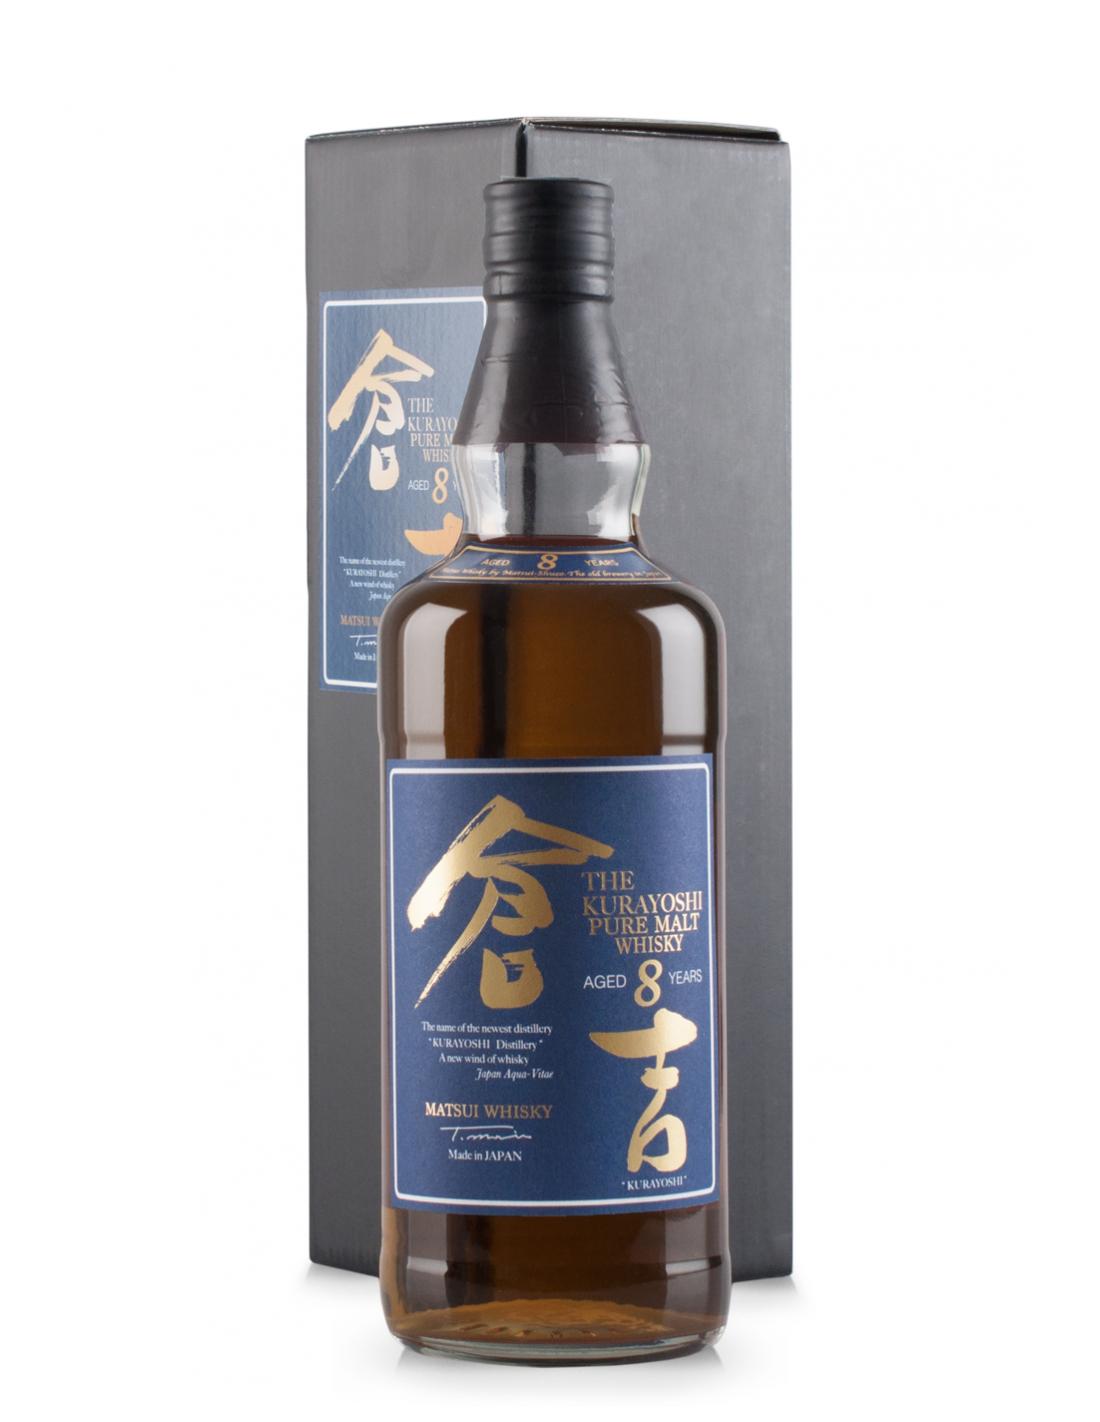 Whisky Matsui Kurayoshi Pure Malt, 8 ani, 43% alc., 0.7L, Japonia